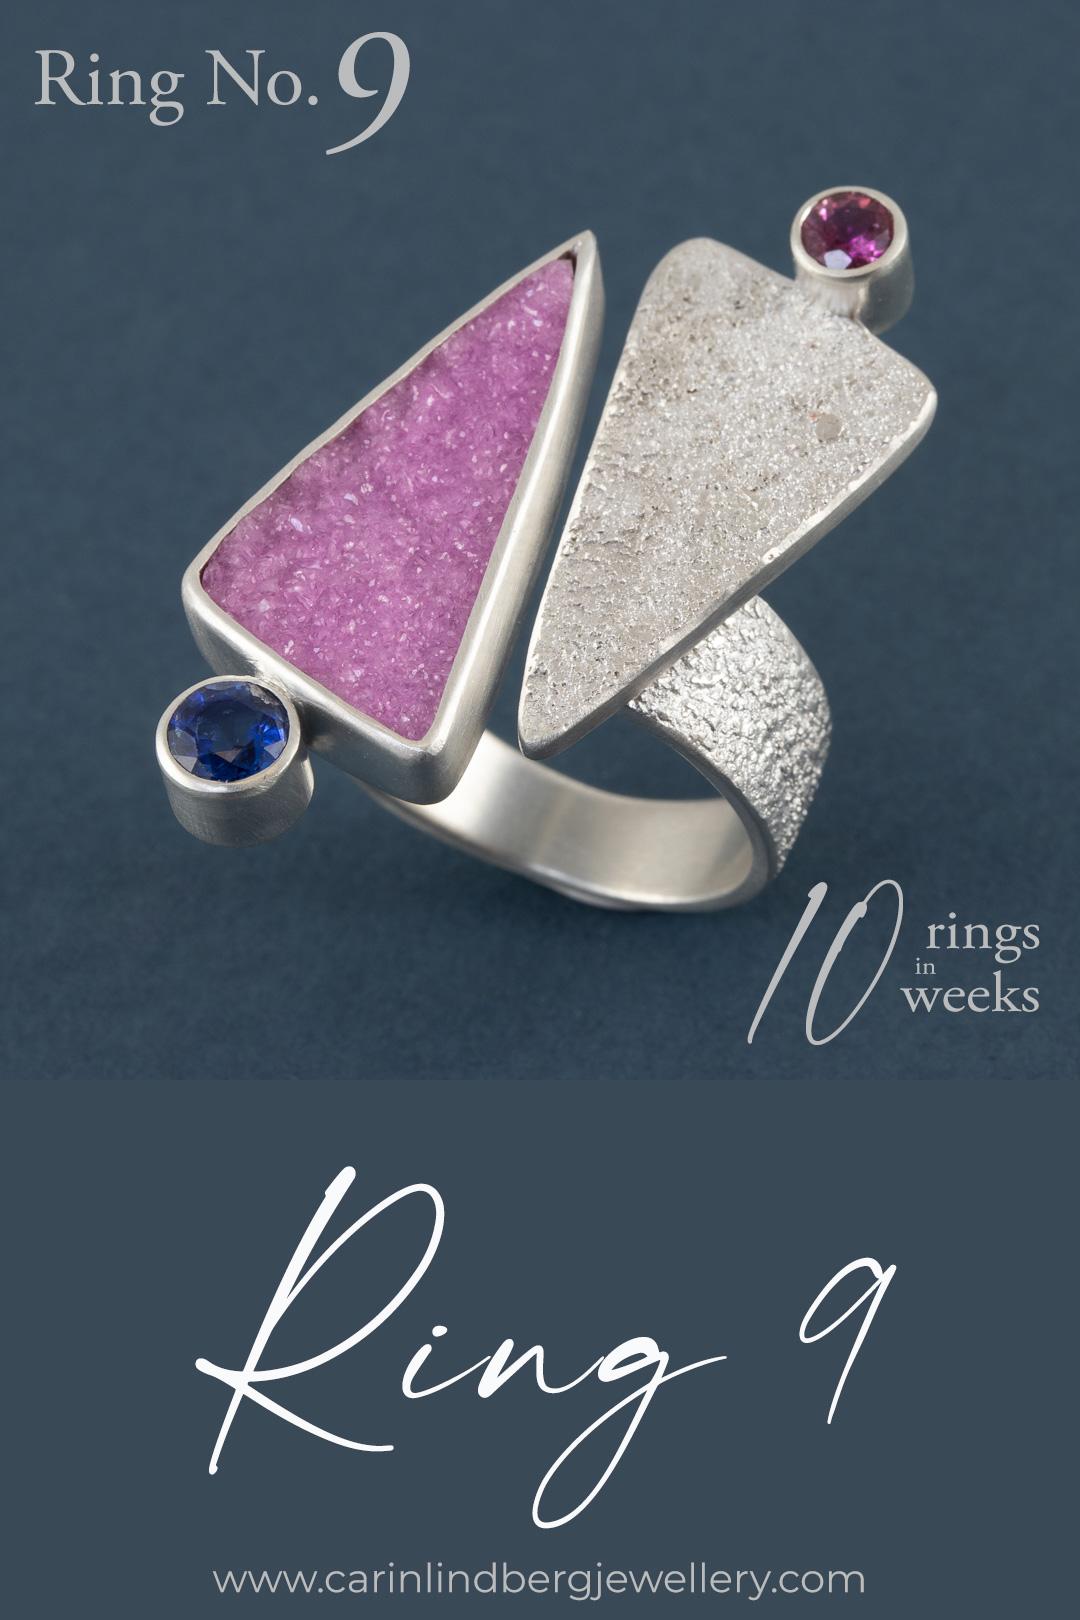 Cobalt calcite ring - an ode to the Foxglove